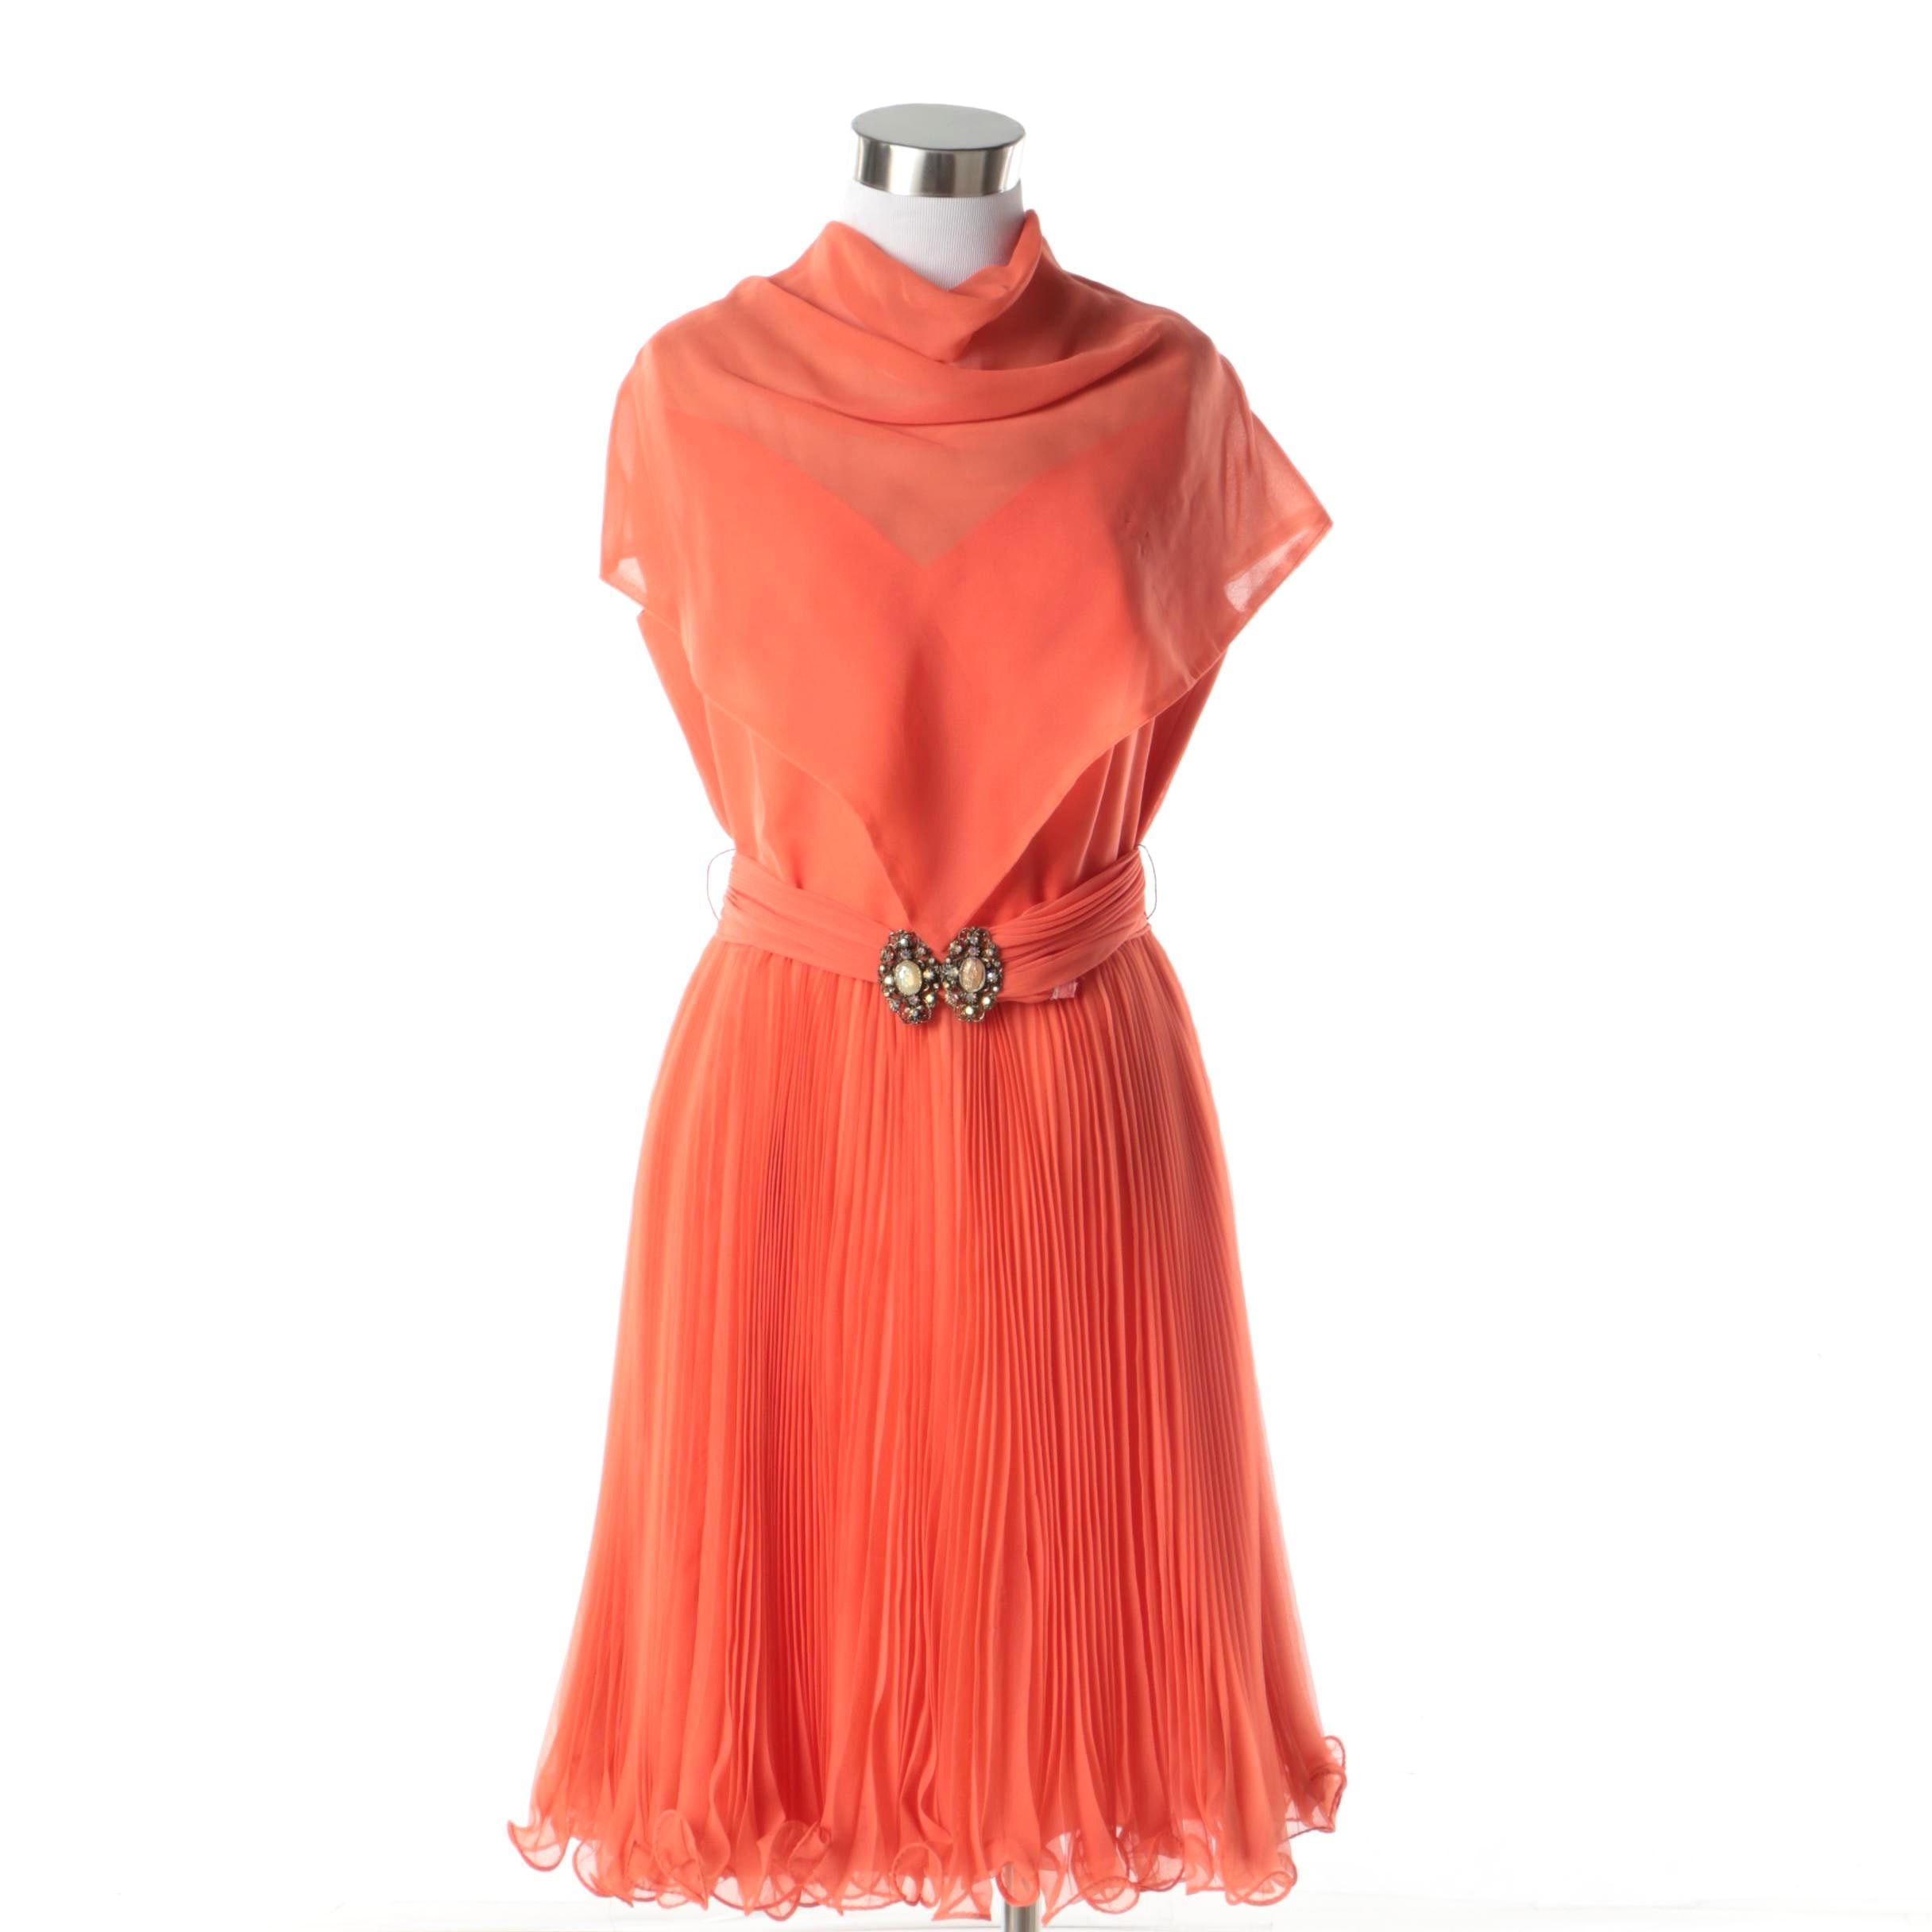 1970s Vintage Jack Bryan Orange Cocktail Dress with Chiffon Pleat Skirt